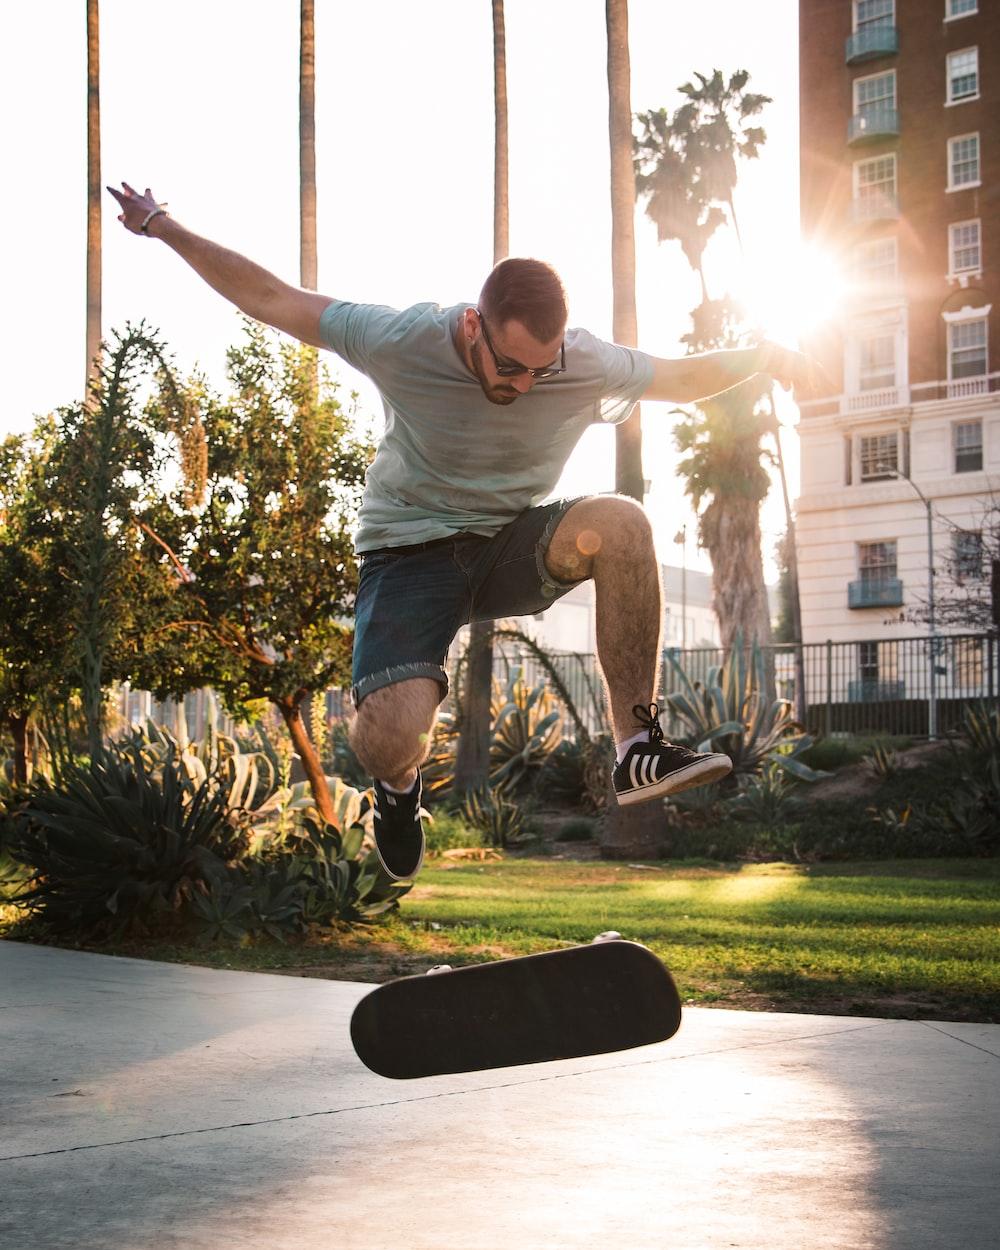 man doing skateboard exhibition at daytime